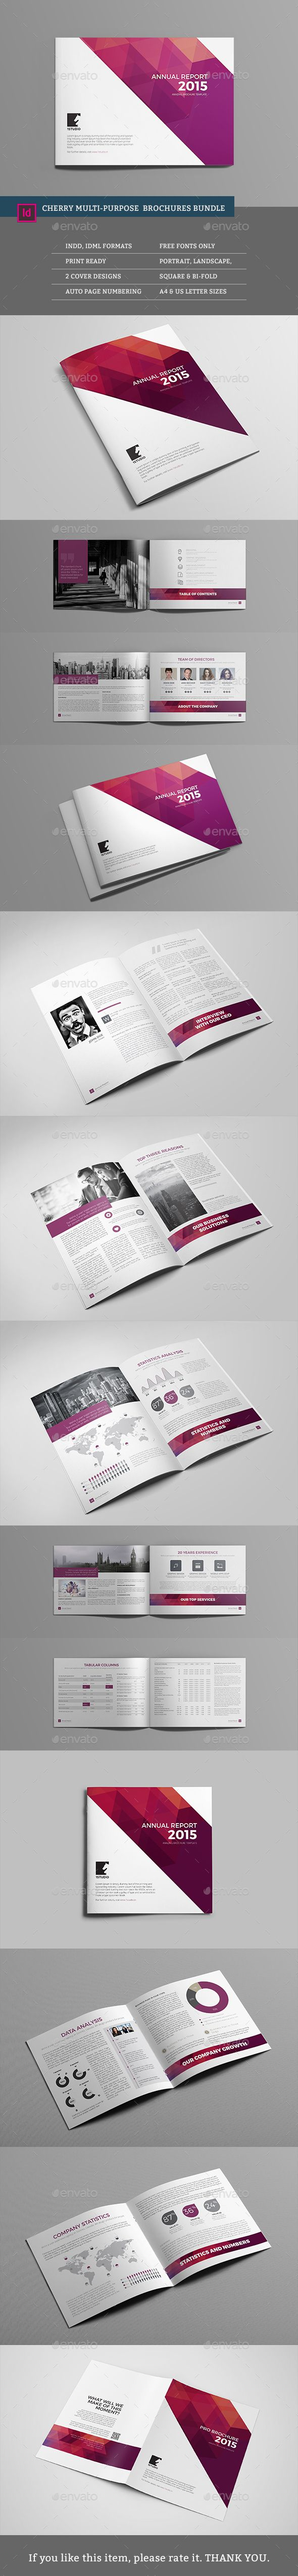 Bundle - Cherry Business Brochures Template PSD #design Download: http://graphicriver.net/item/bundle-cherry-business-brochures/14312736?ref=ksioks